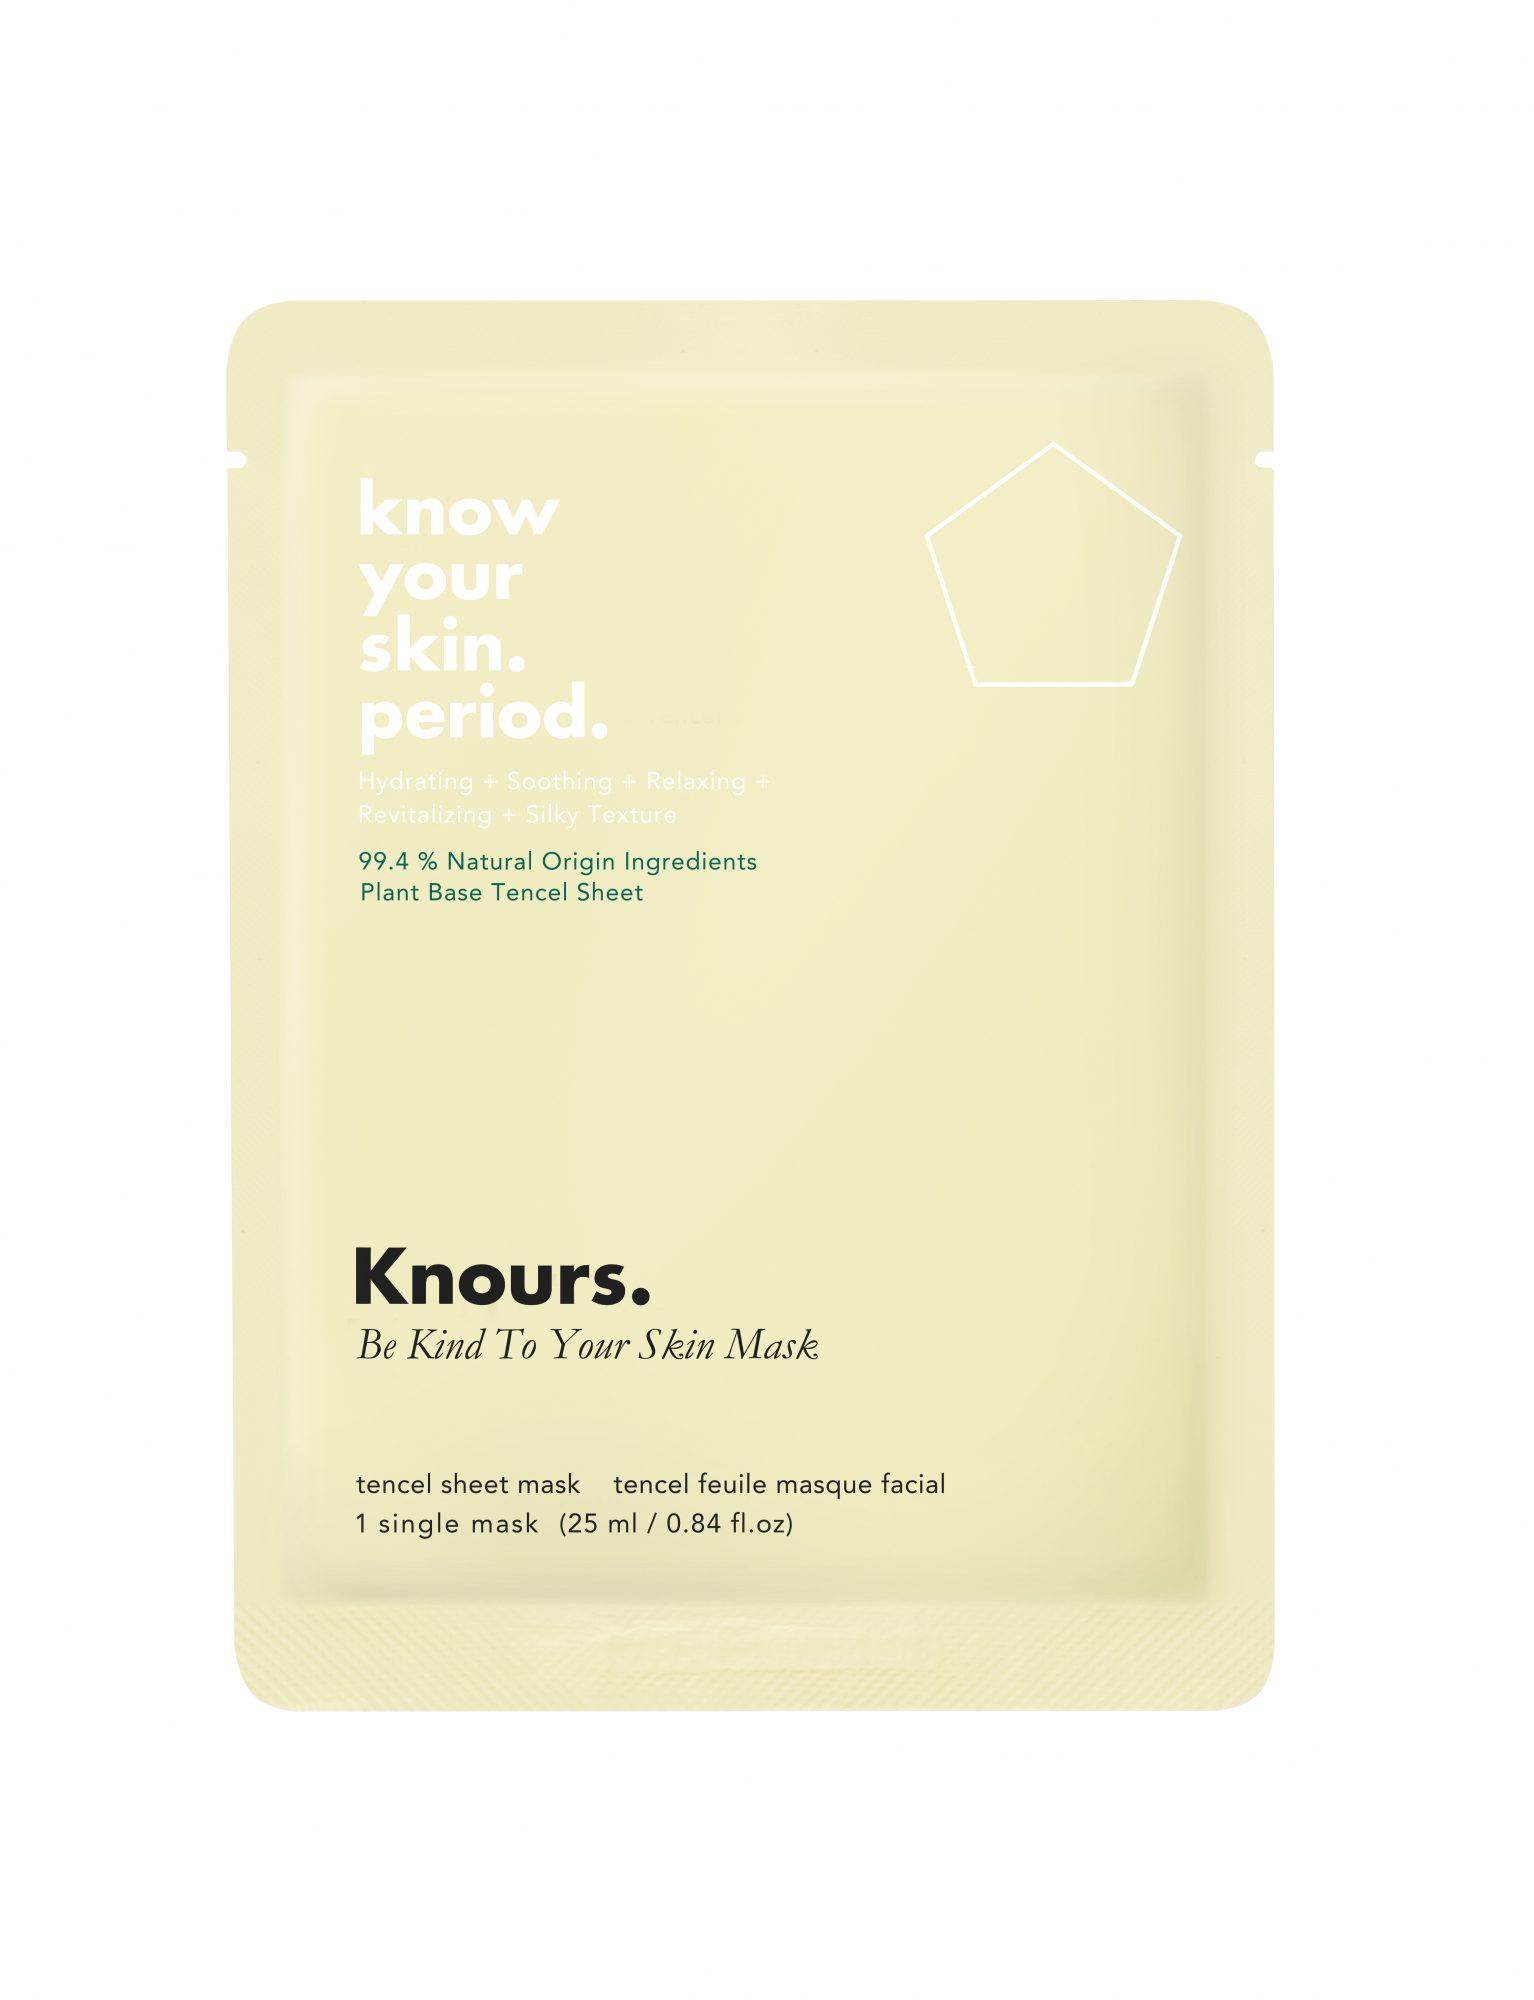 Knours